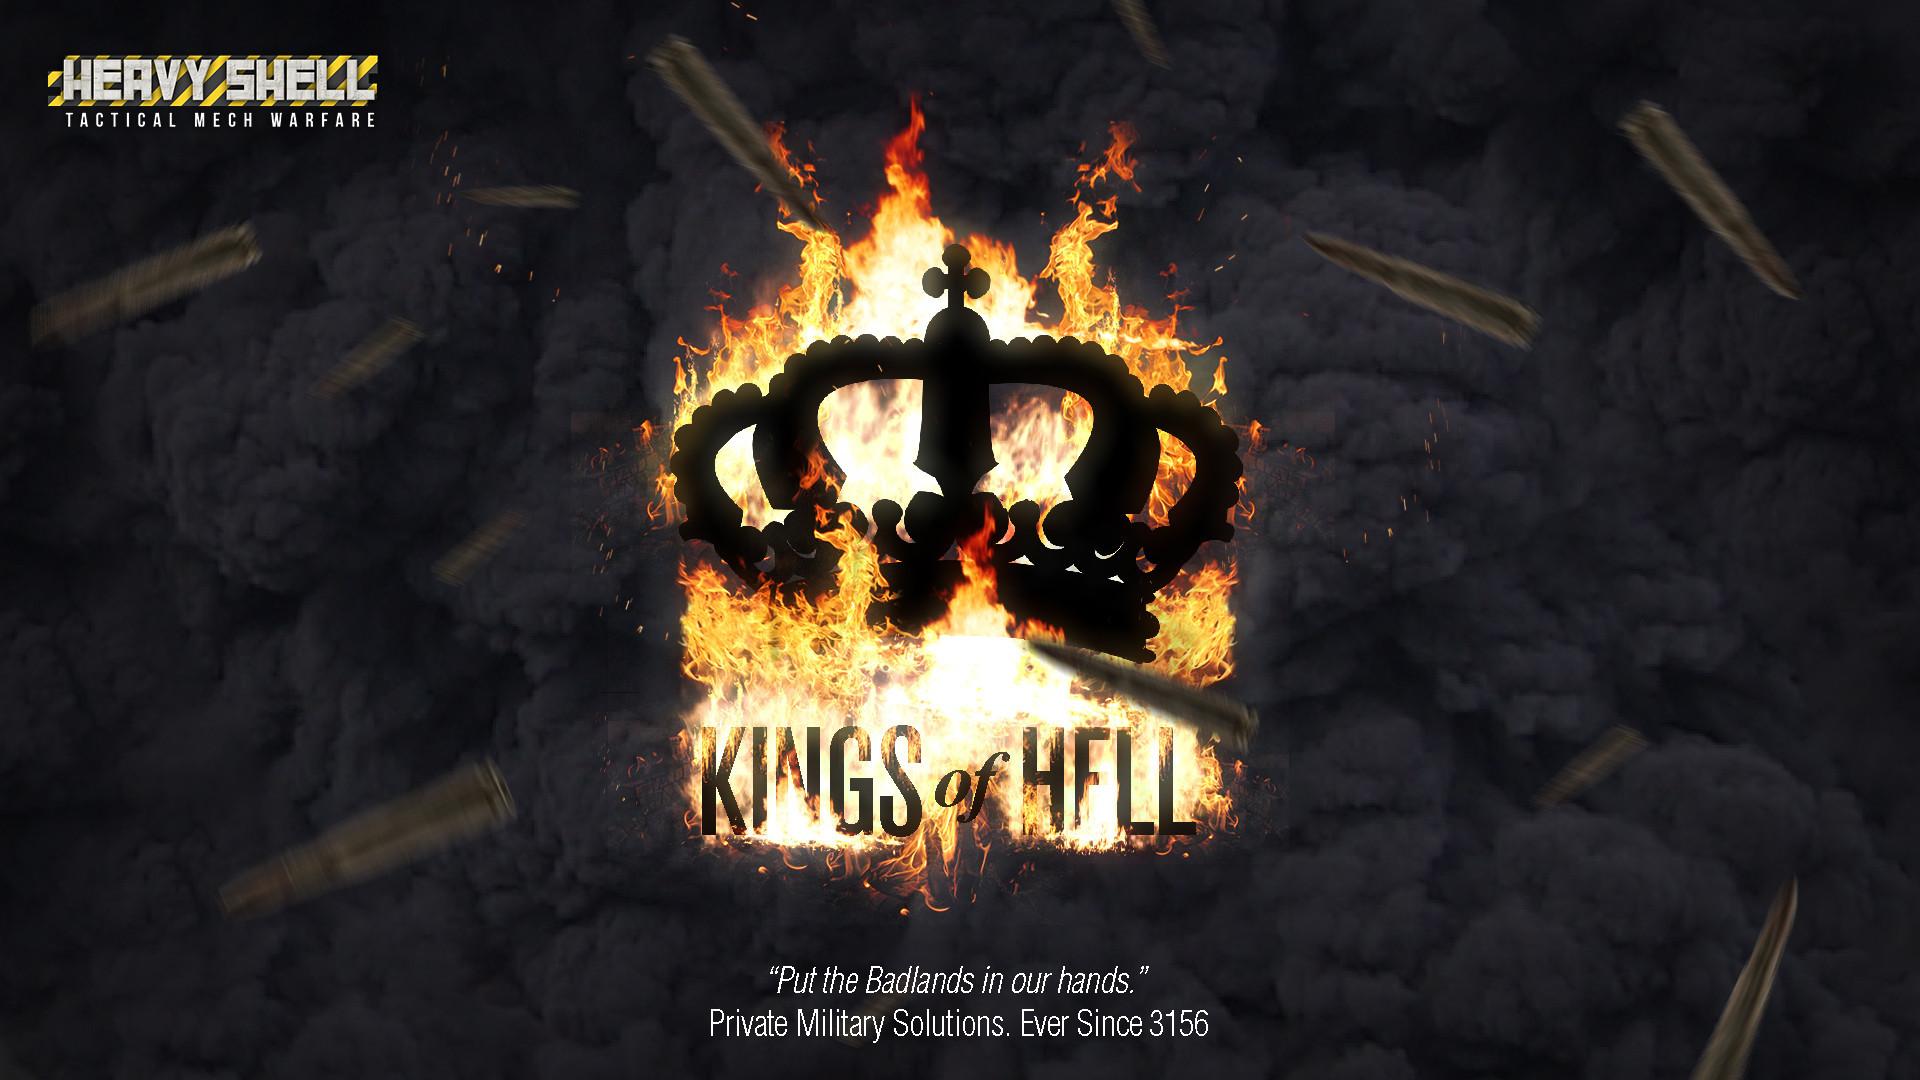 Hip Hop Wallpaper Iphone 7 Tyga Last Kings Wallpaper Hd 183 ①